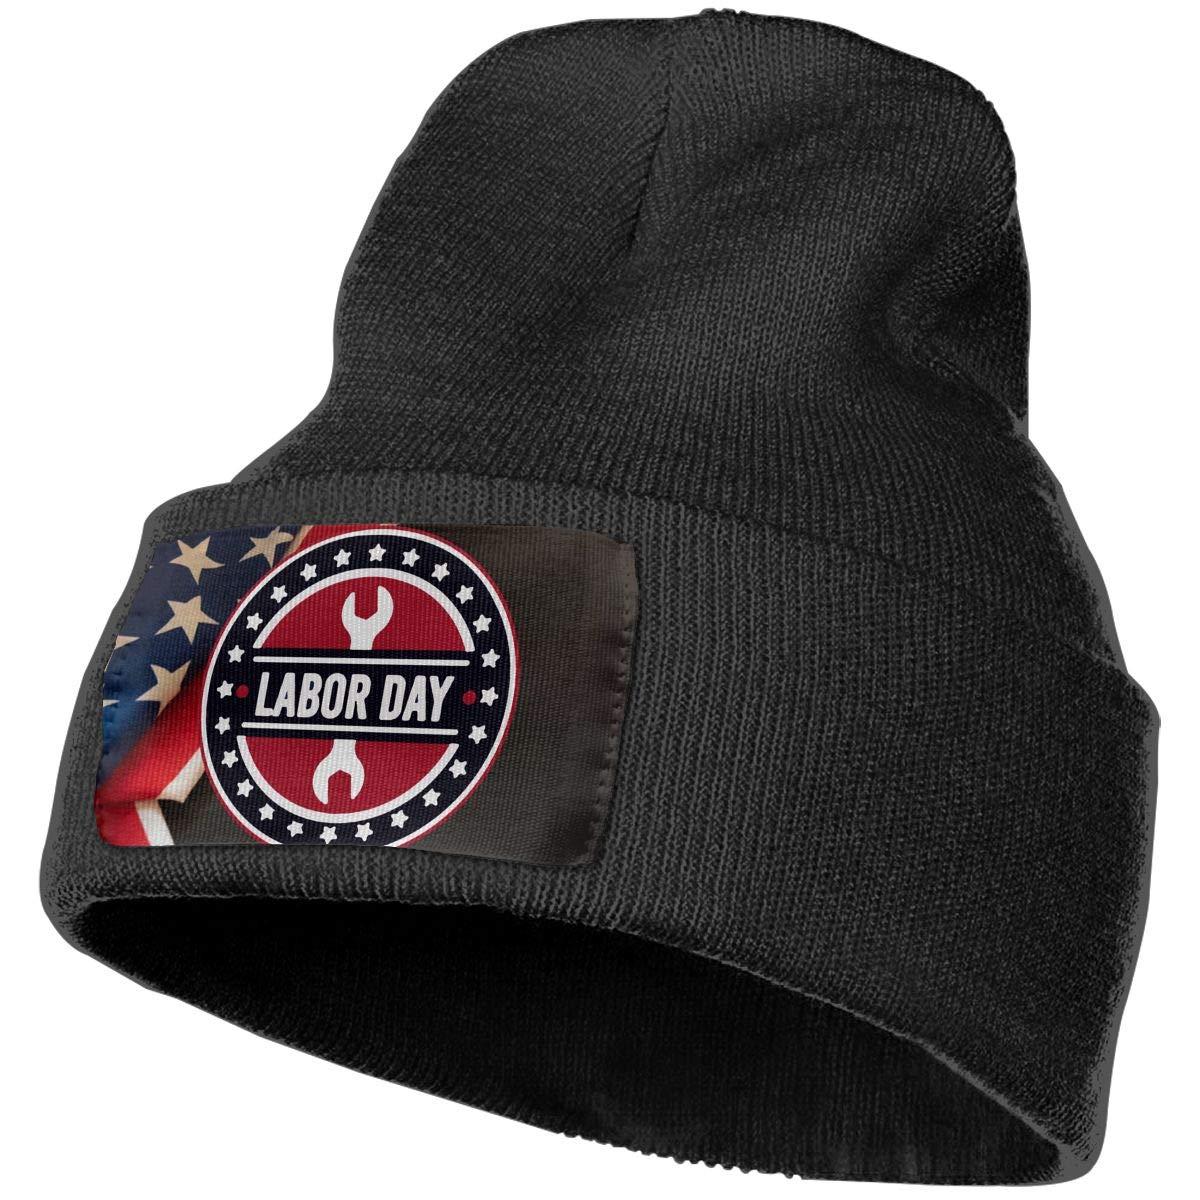 Labor Day American Flag Ski Cap Men Women Knit Hats Stretchy /& Soft Beanie